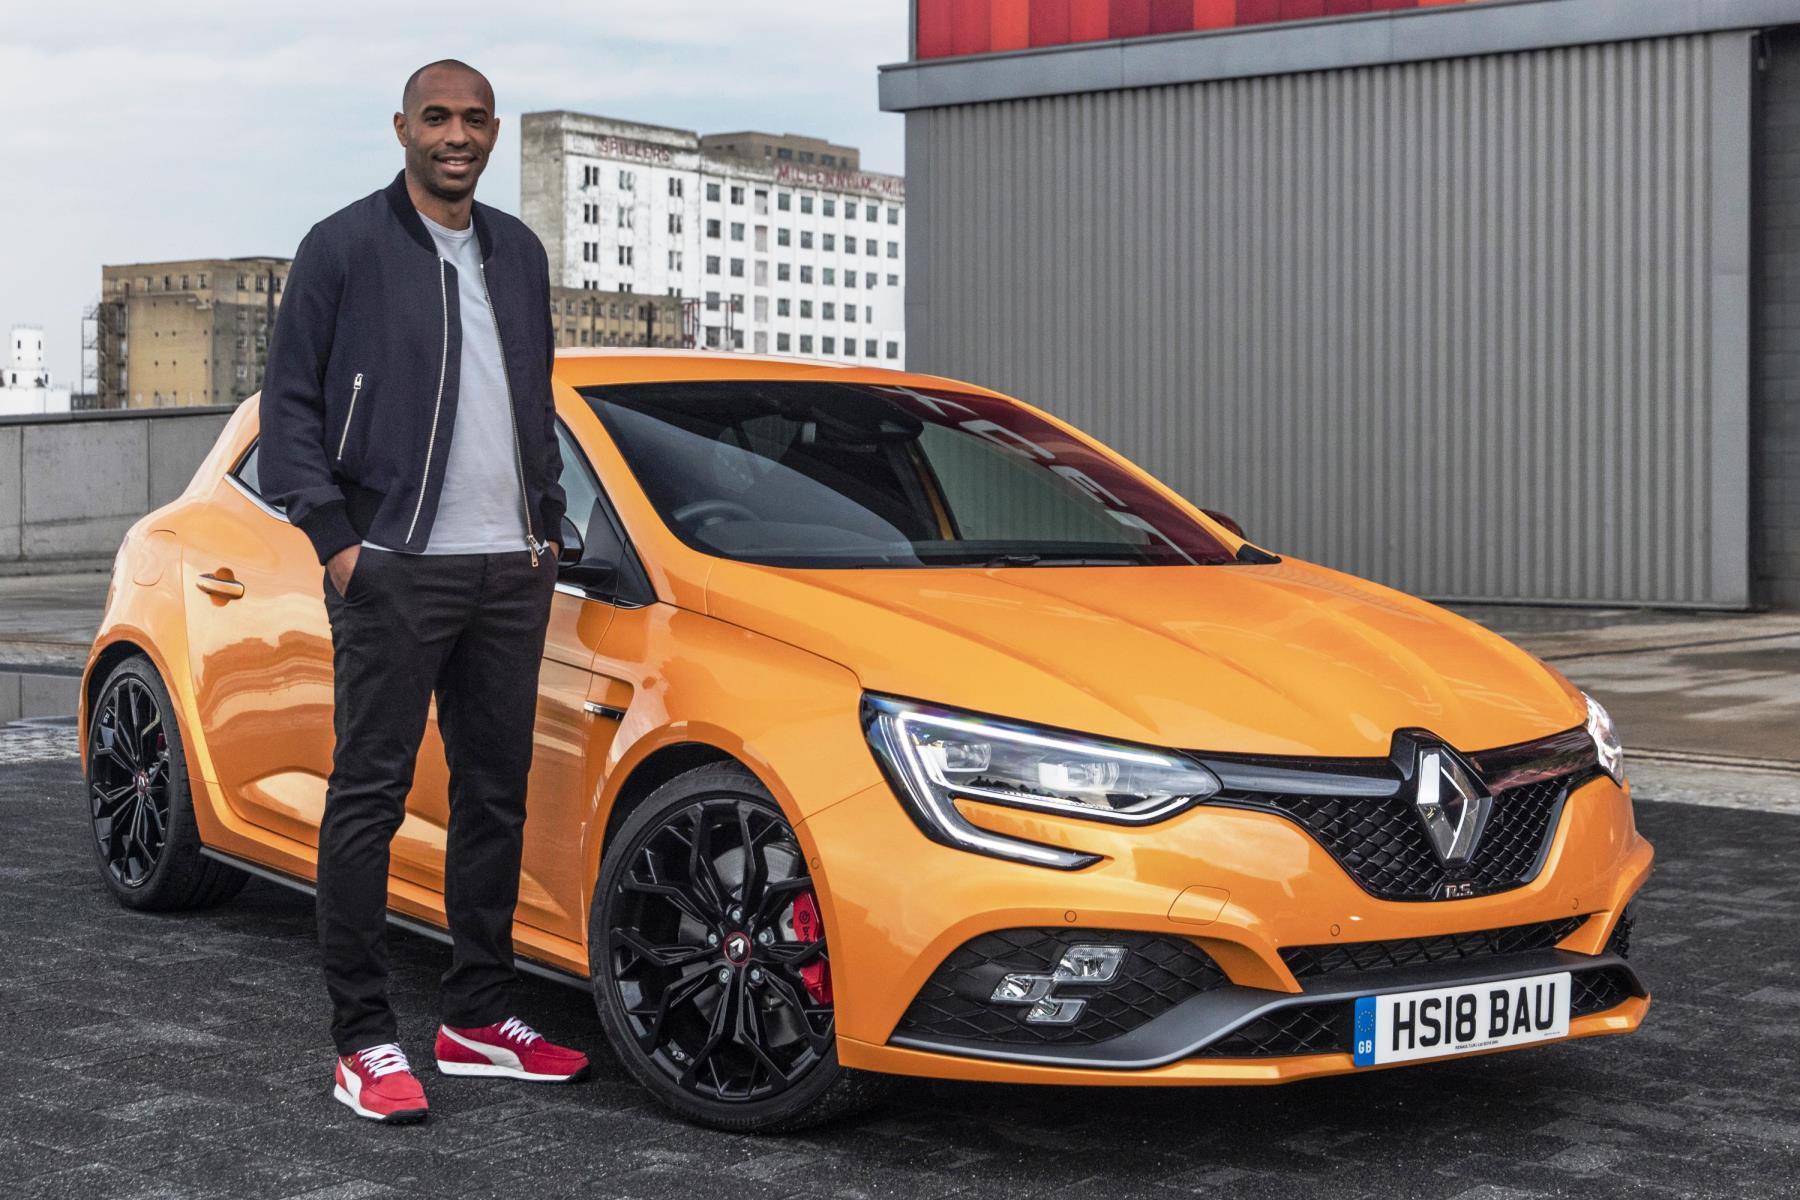 Va Va Voom is back - Thierry Henry returns to Renault (1)